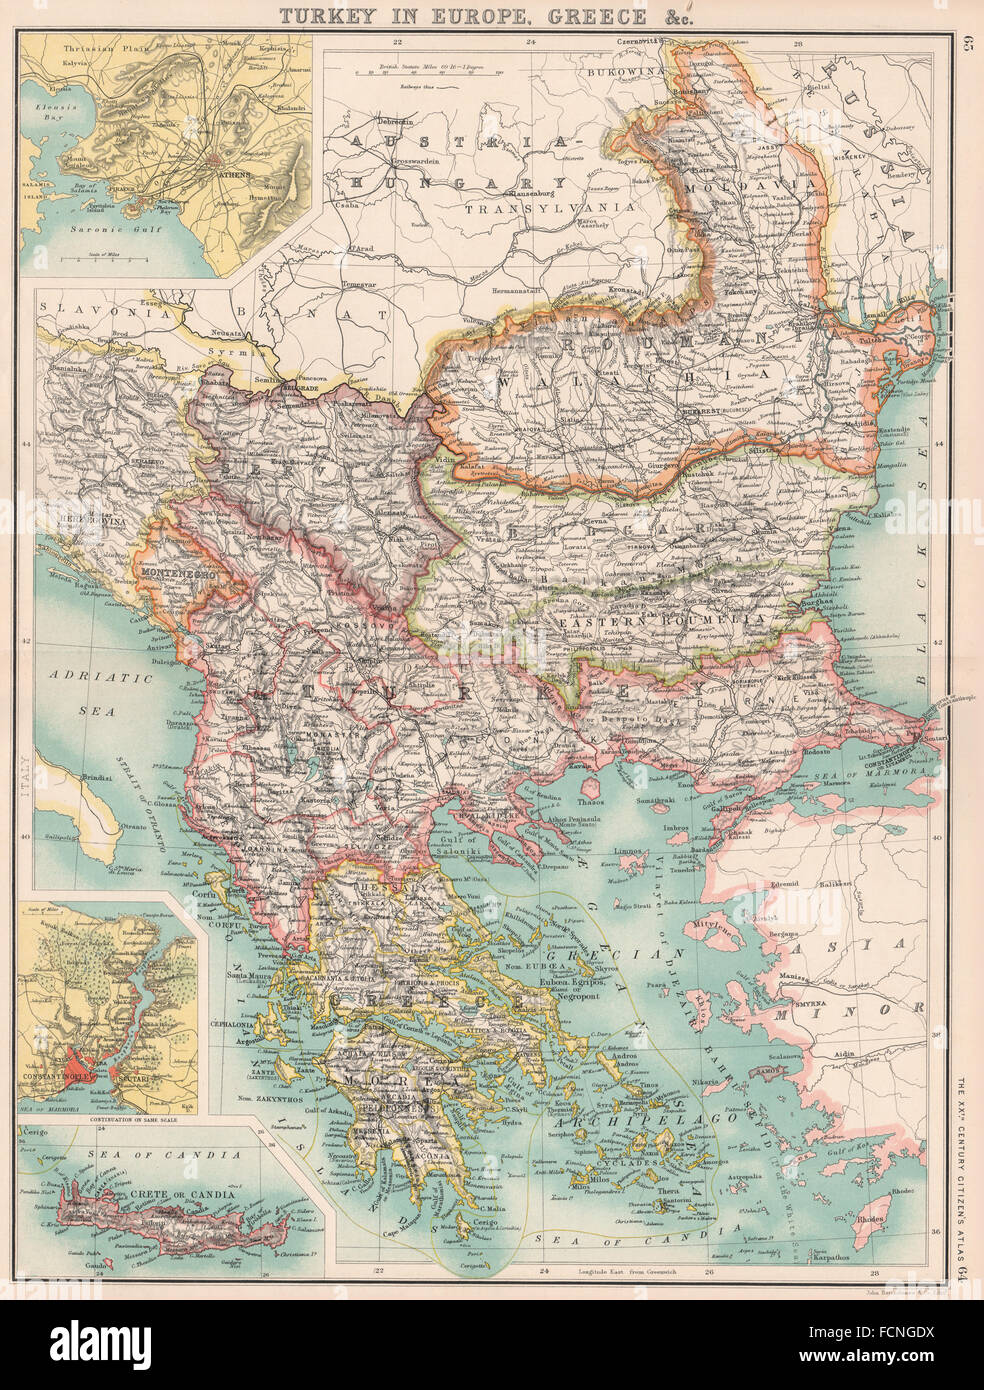 Balkans Turkey In Europe Greece E Roumelia Constantinople Stock